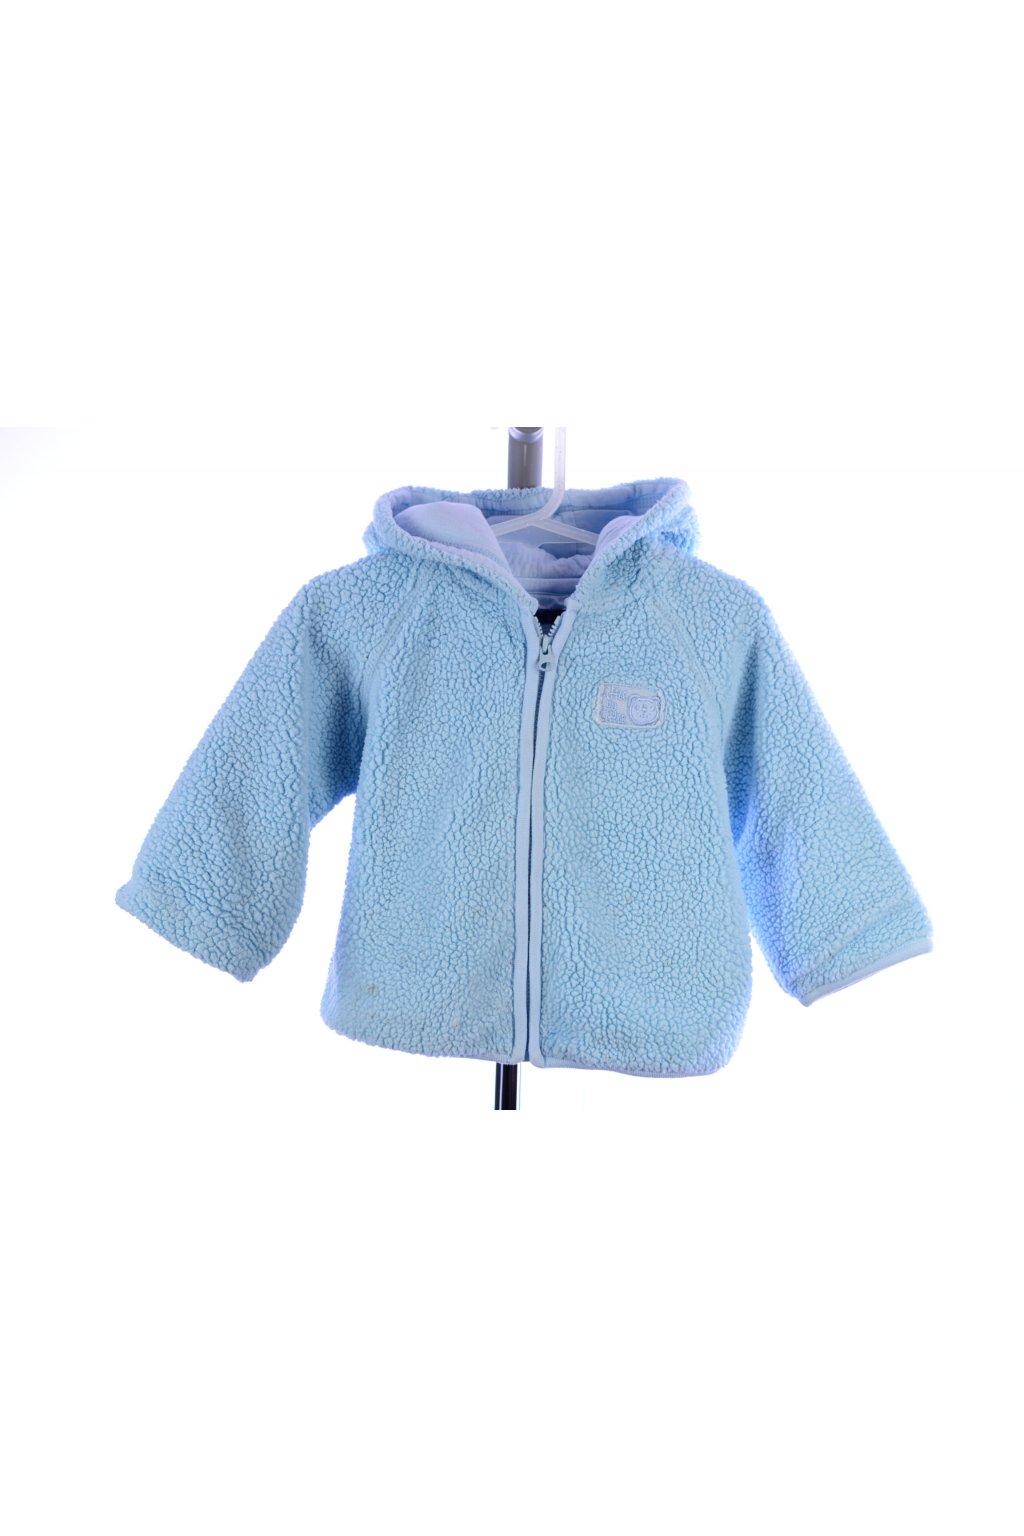 Bunda kabátek vel 86 modrý česaný flís